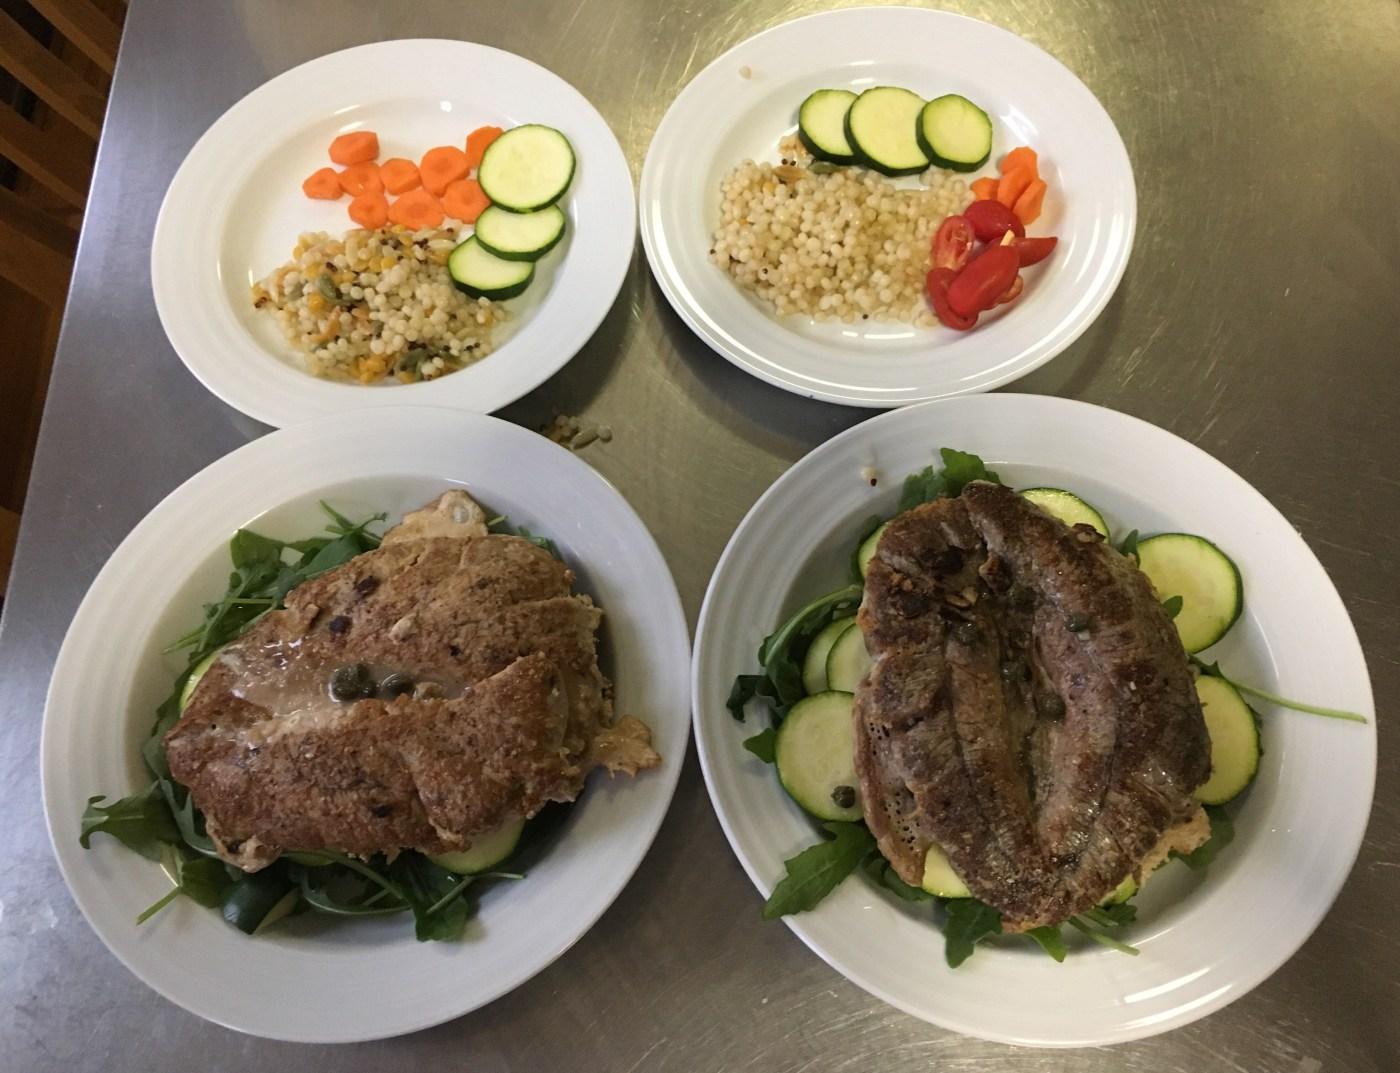 Shad Roe Grain Bowls plus Veggie Kids Meal